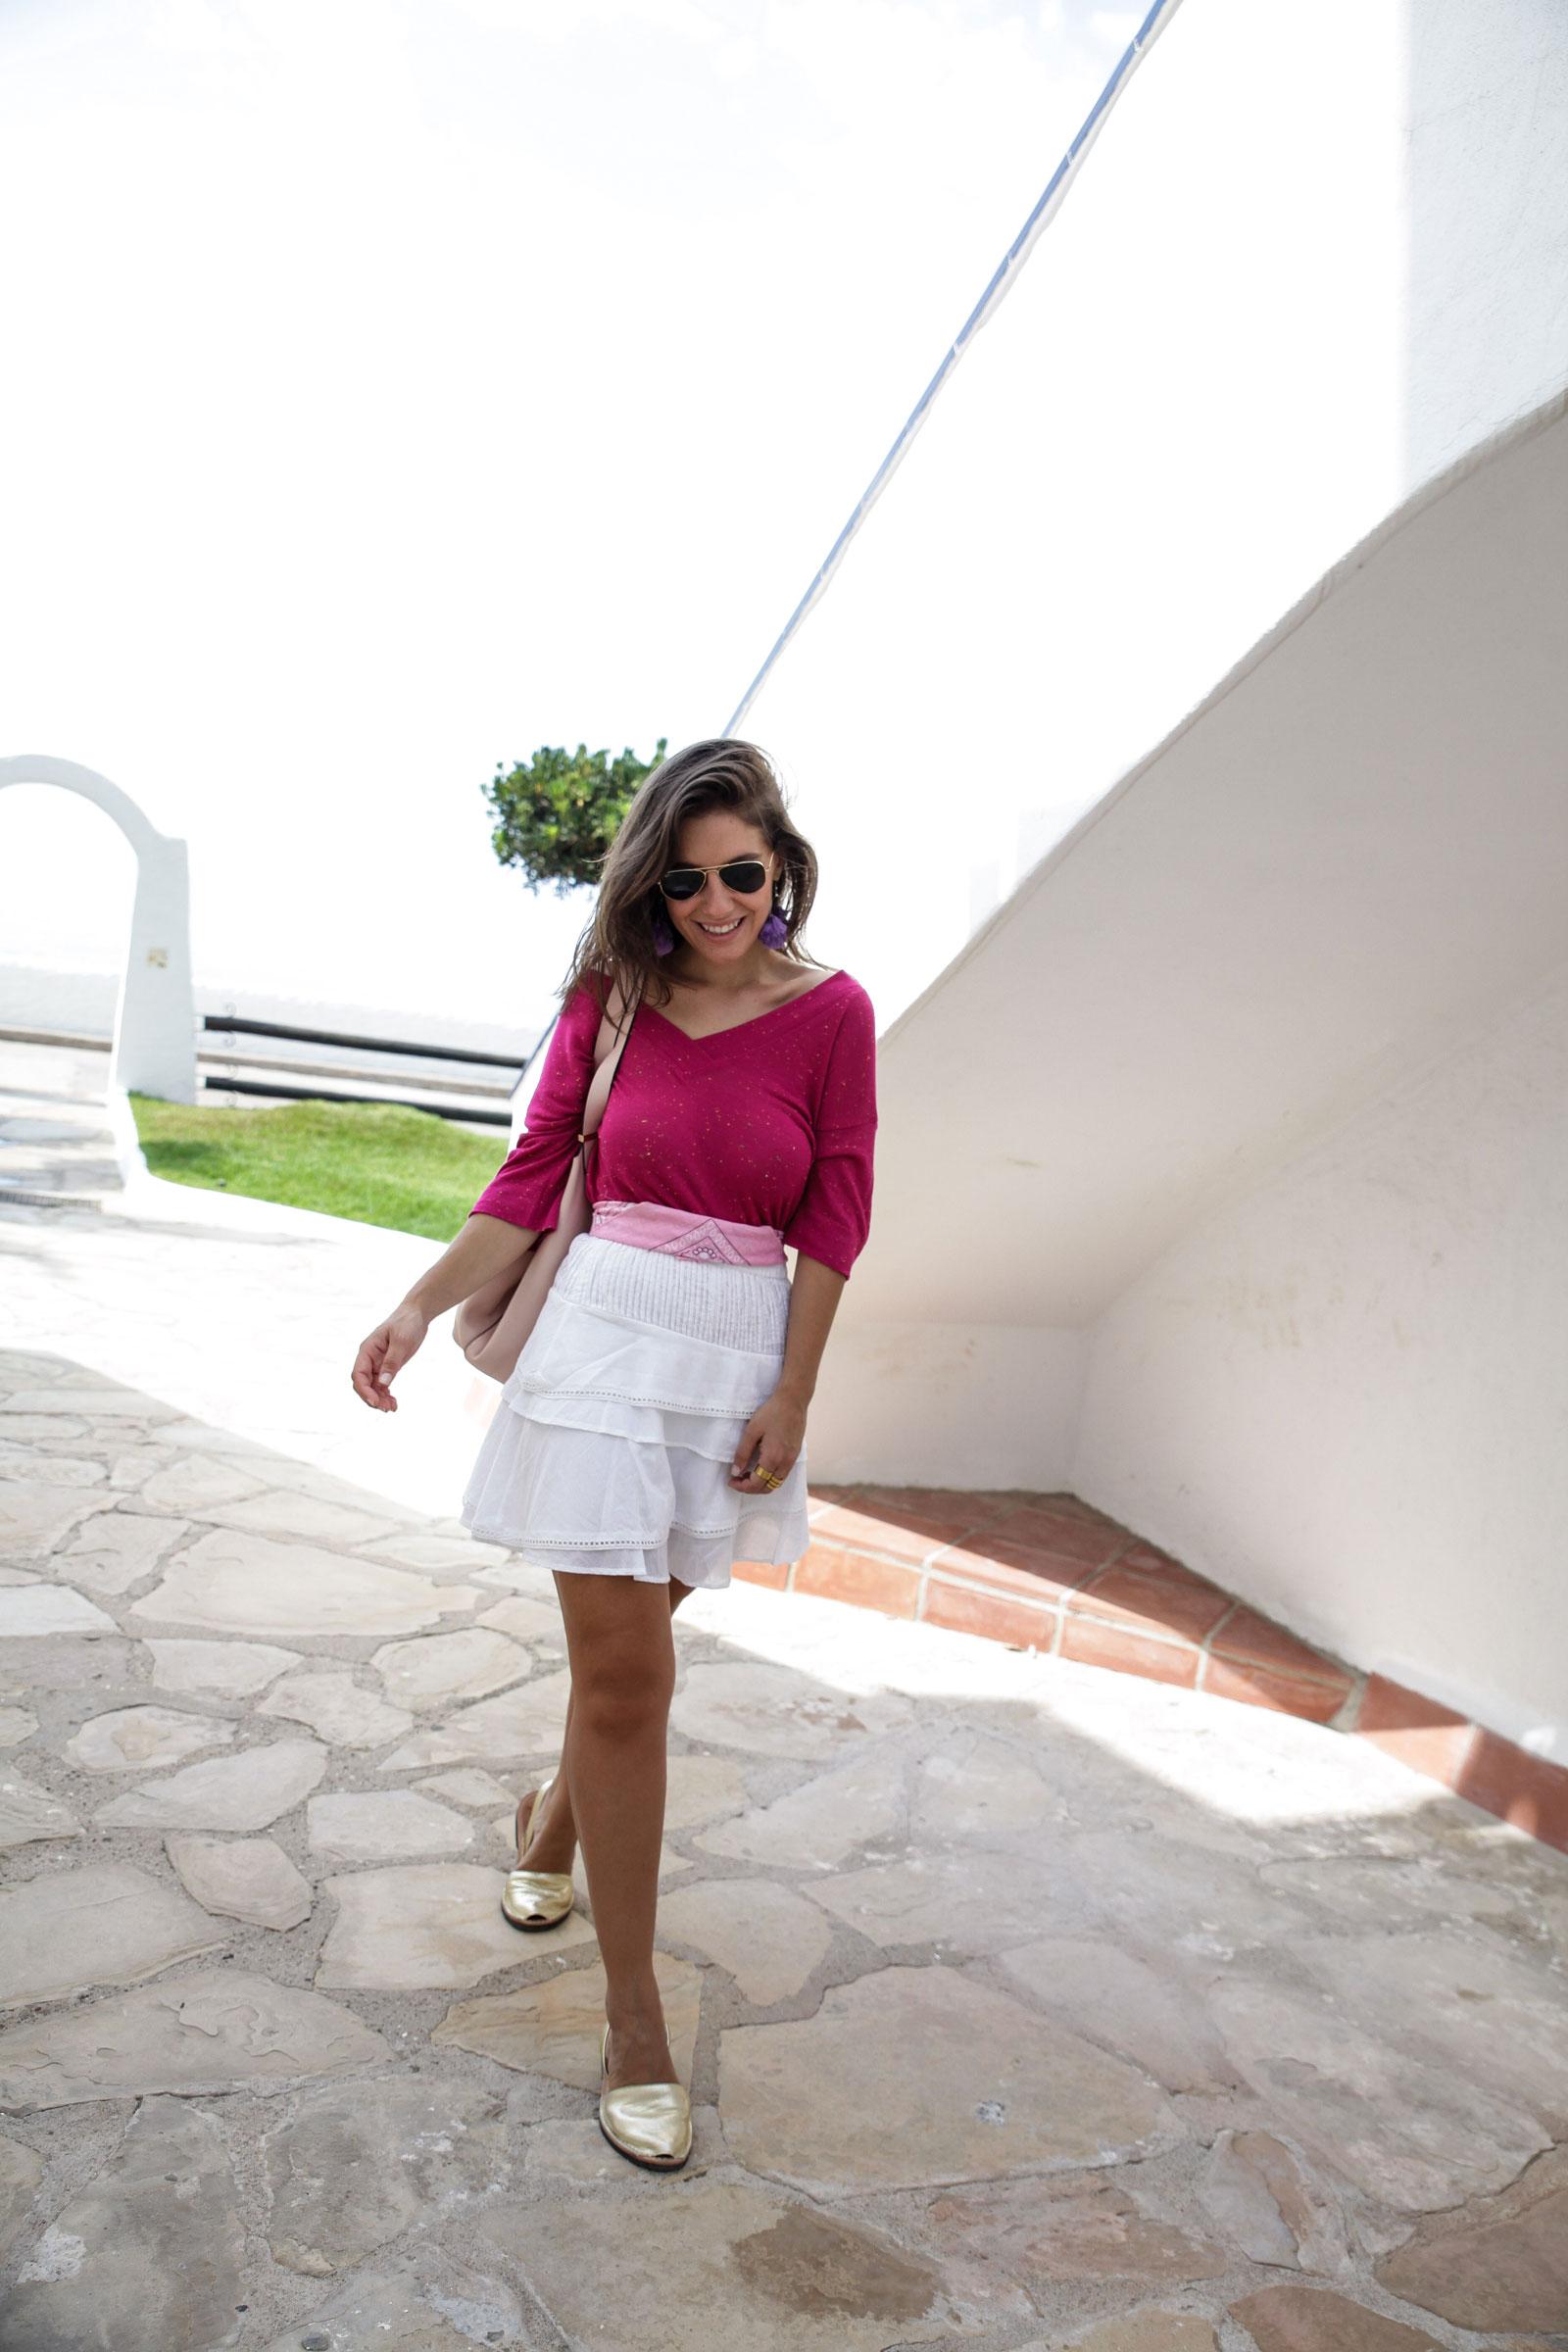 012_Camiseta_rosa_rüga_falda_blanca_look_verano_theguestgirl_laura_influencer_barcelona_españa_spain_ootd_inspo